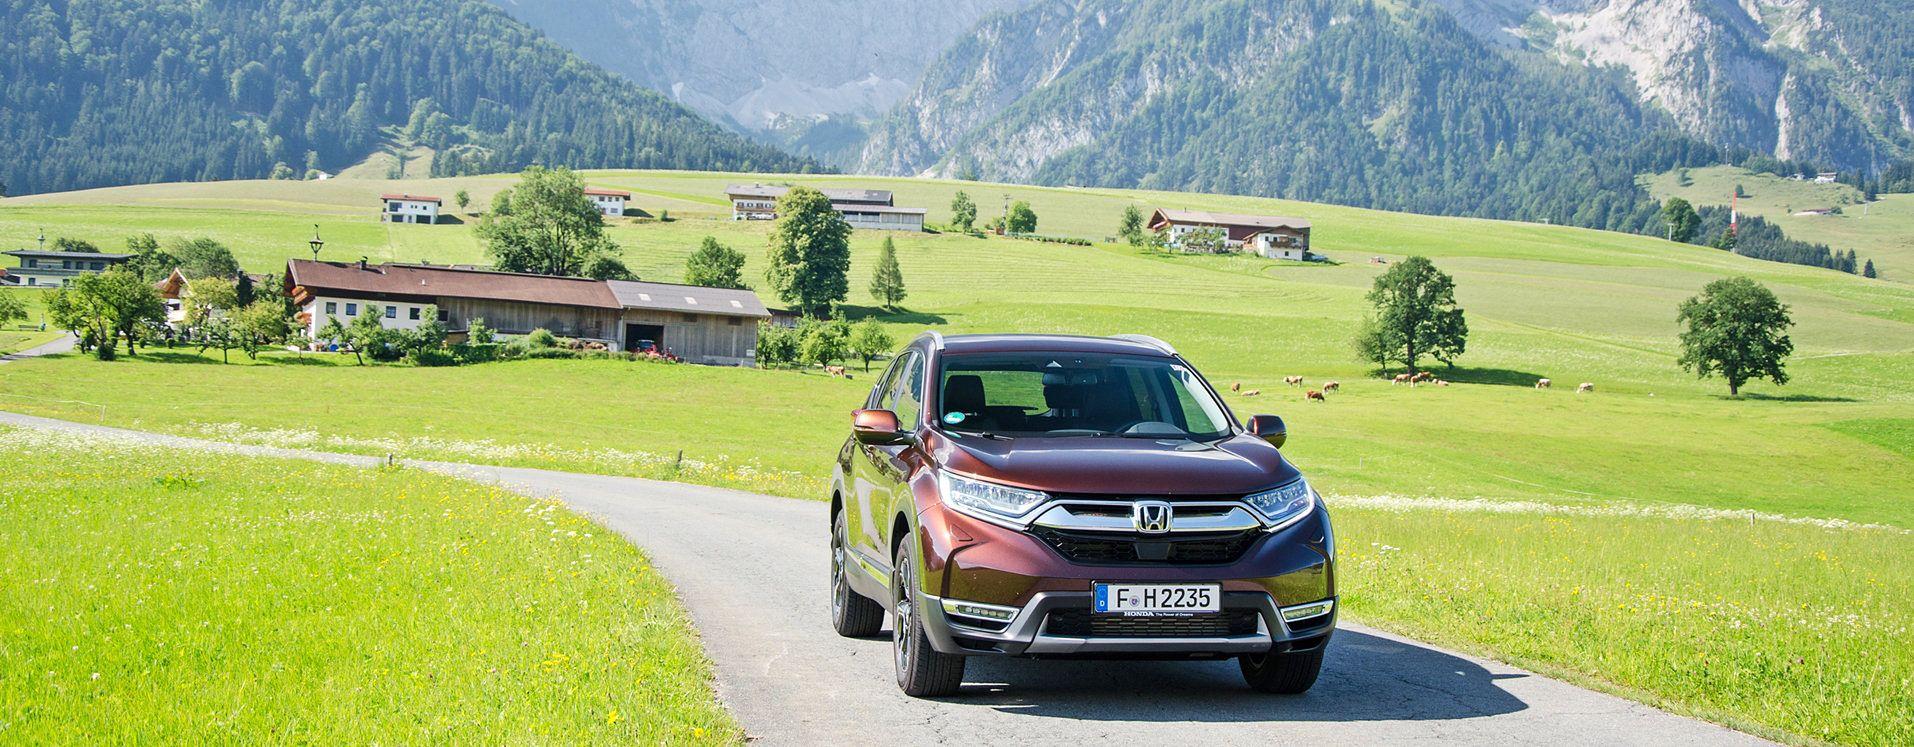 Nowa Honda CR-V 1.5 VTEC Turbo